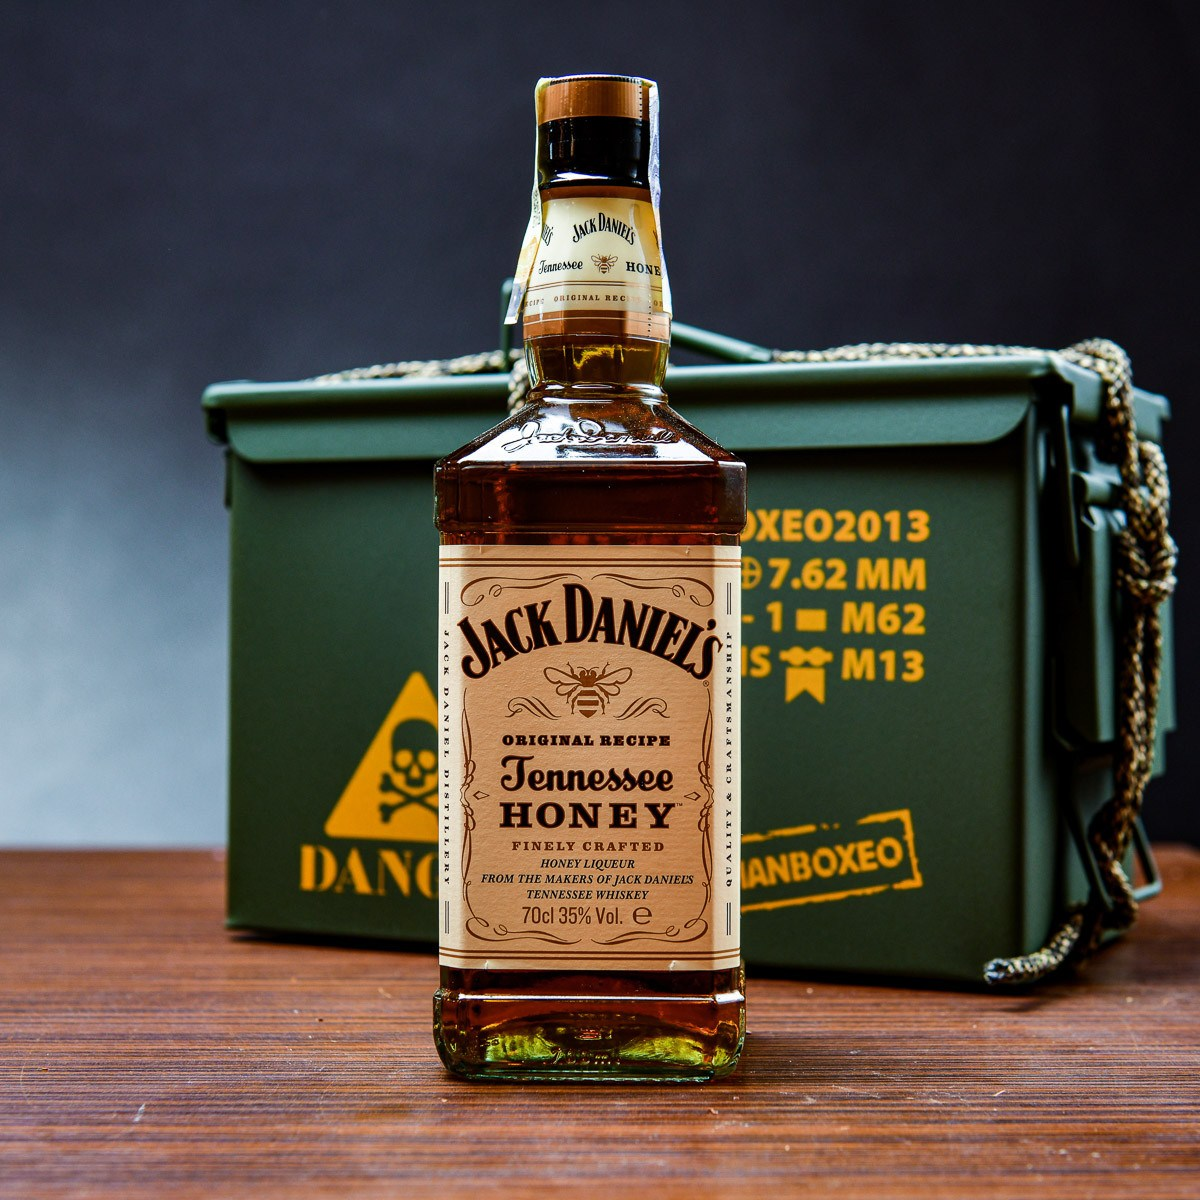 Armyboxeo Jack Daniel's Honey